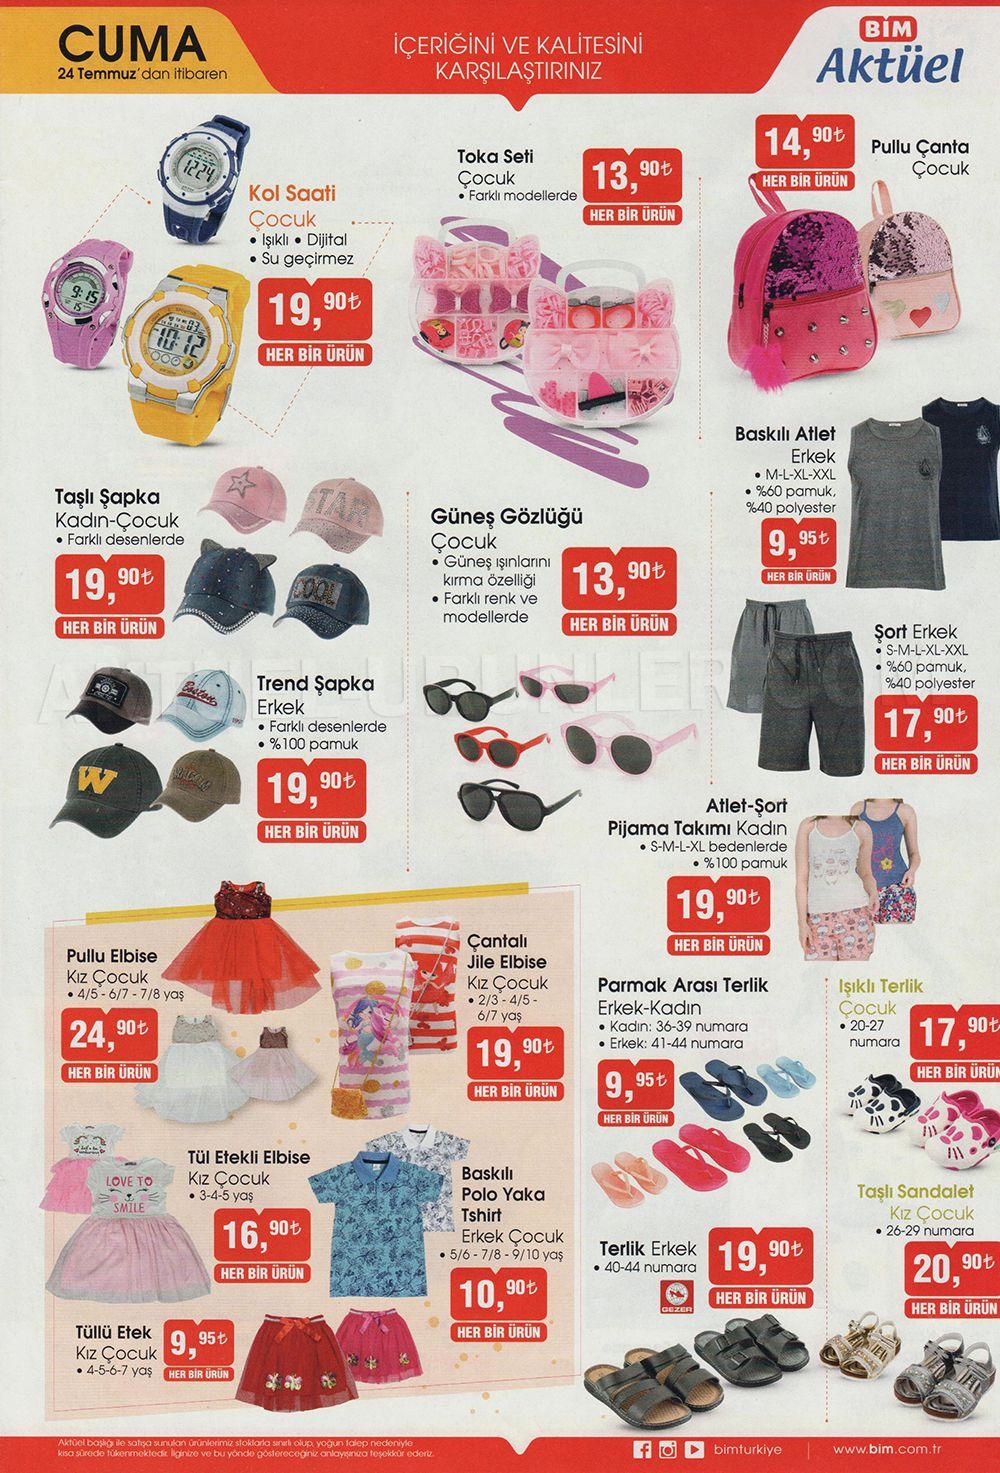 Bim-24-Temmuz-2020-Cuma-Tekstil-Urunleri-Katalogu